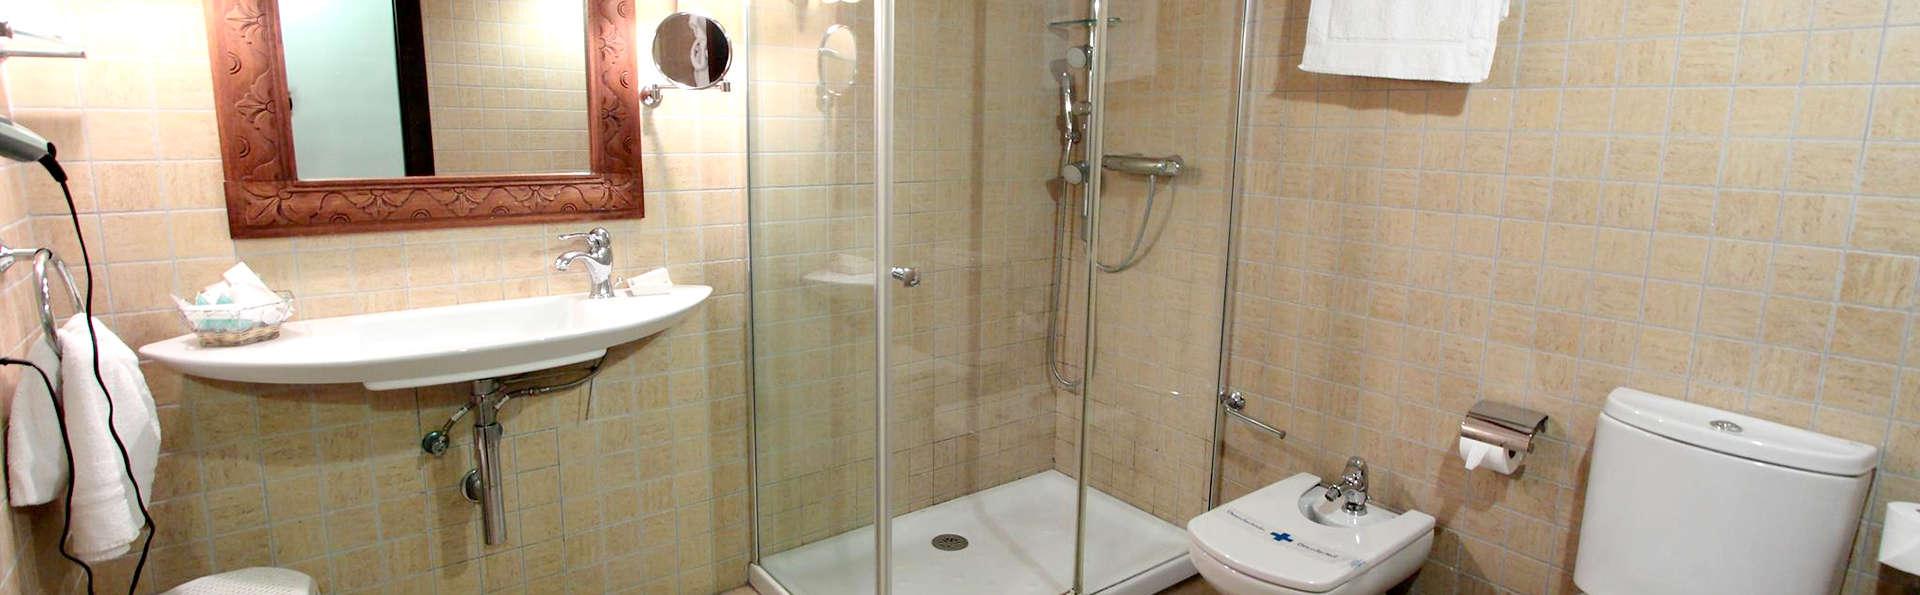 Hotel Tossal d'Altea - Edit_Bathroom2.jpg